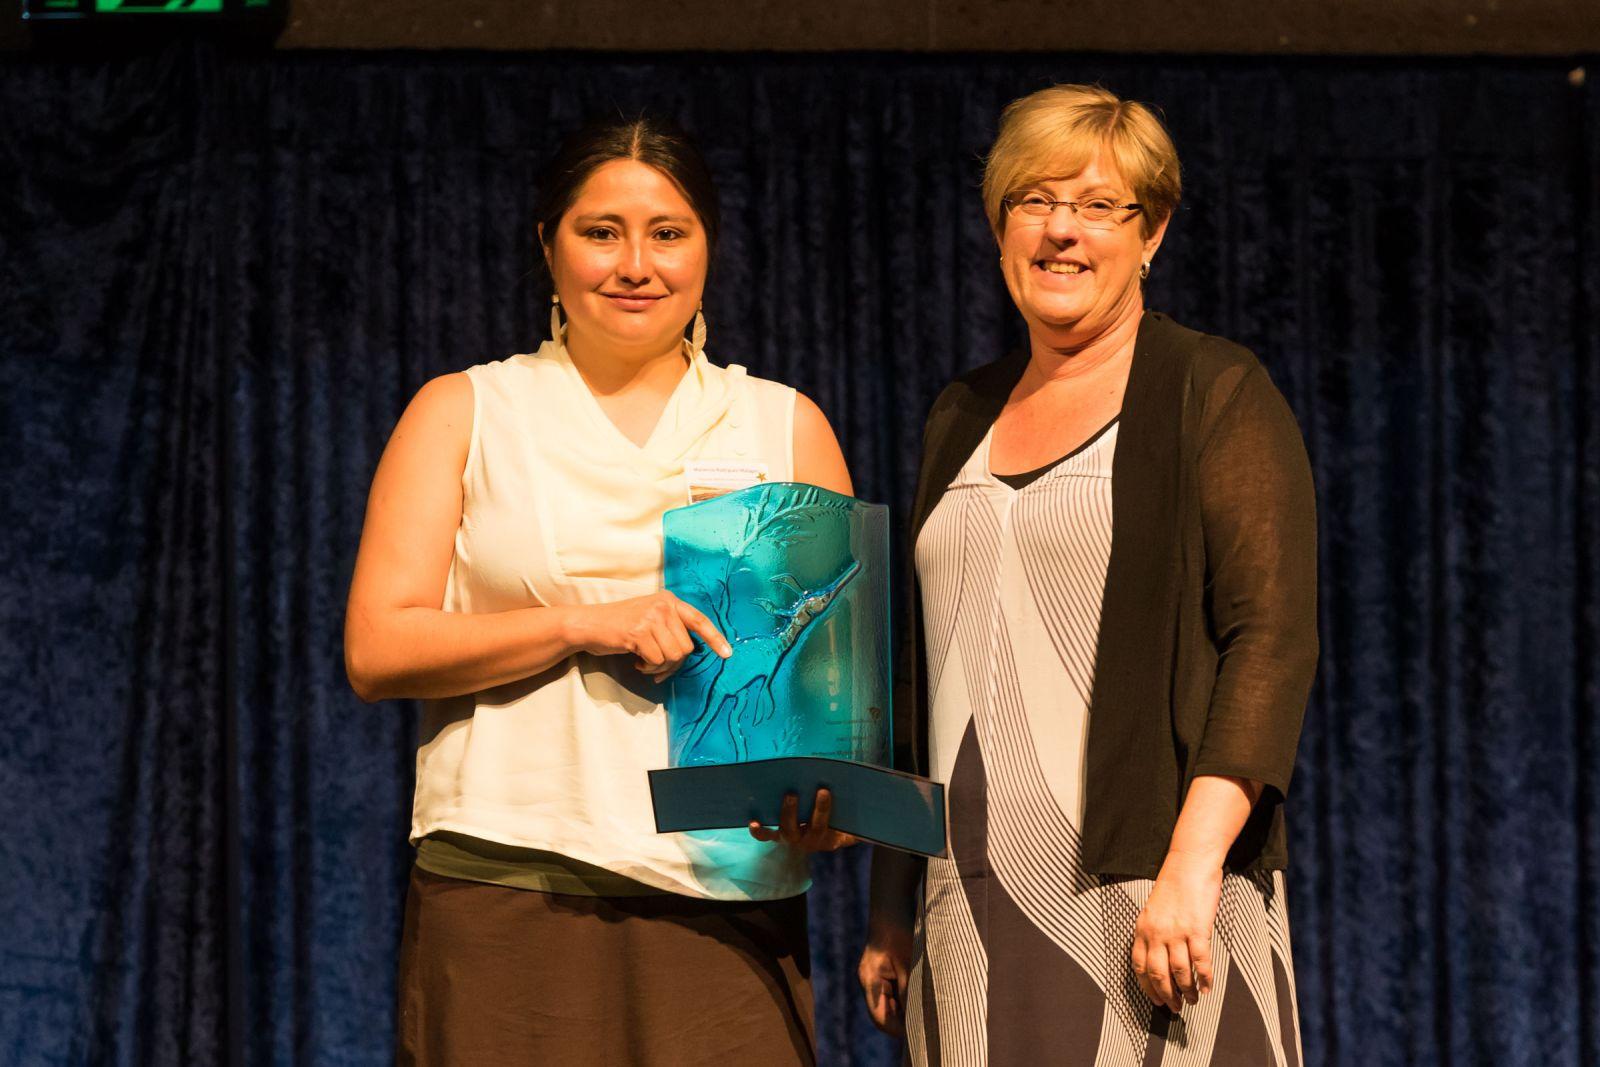 VMSC Postgraduate Marine Research Award: Marlenne Rodriguez-Malagon